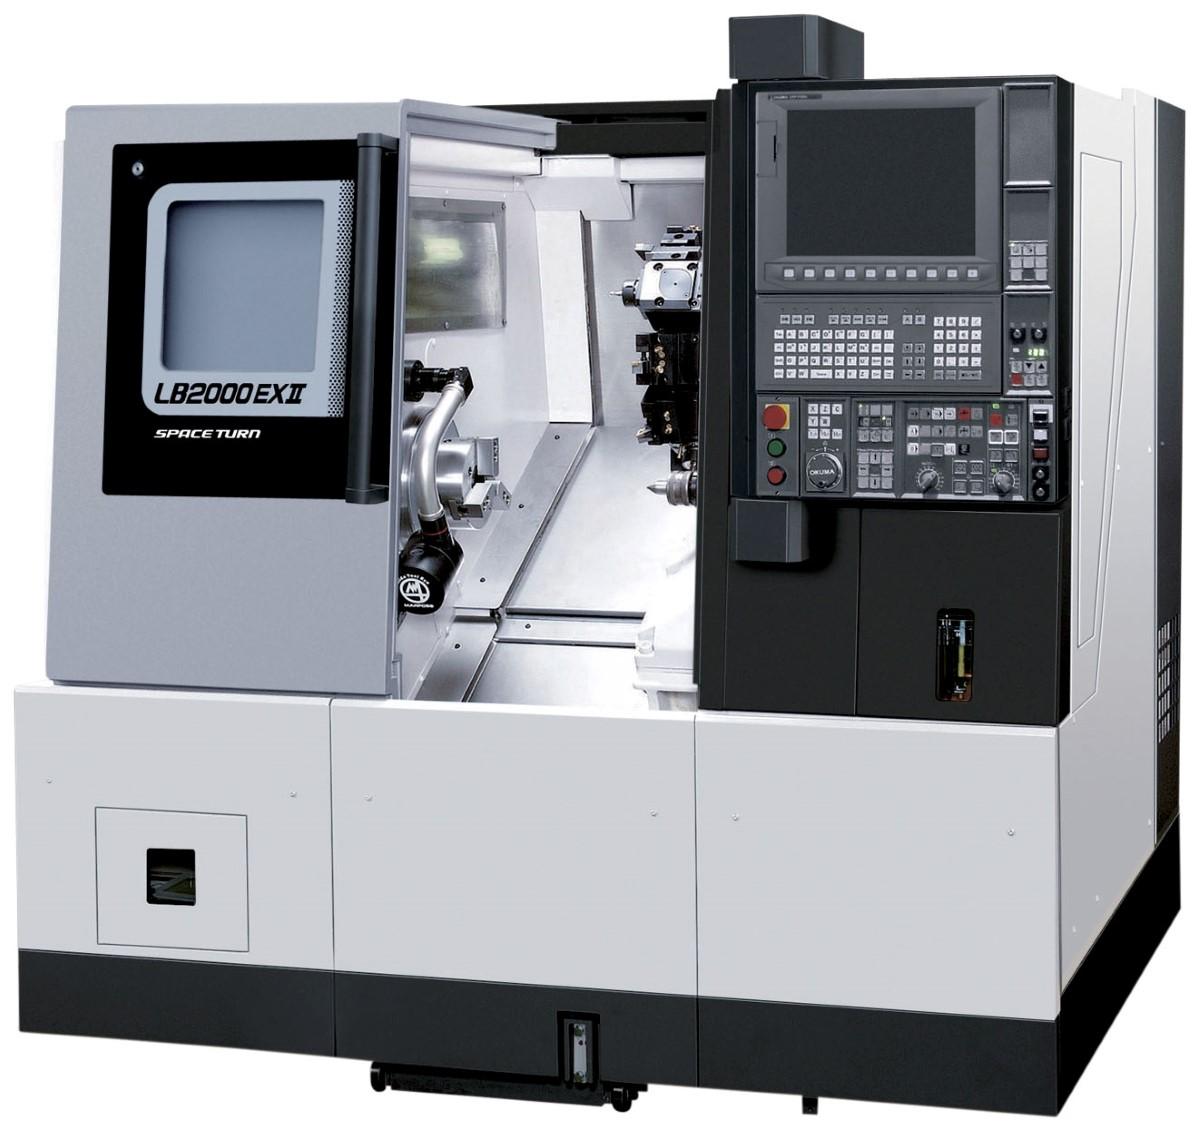 Okuma LB 2000 EX MW CNC tekinimo įranga